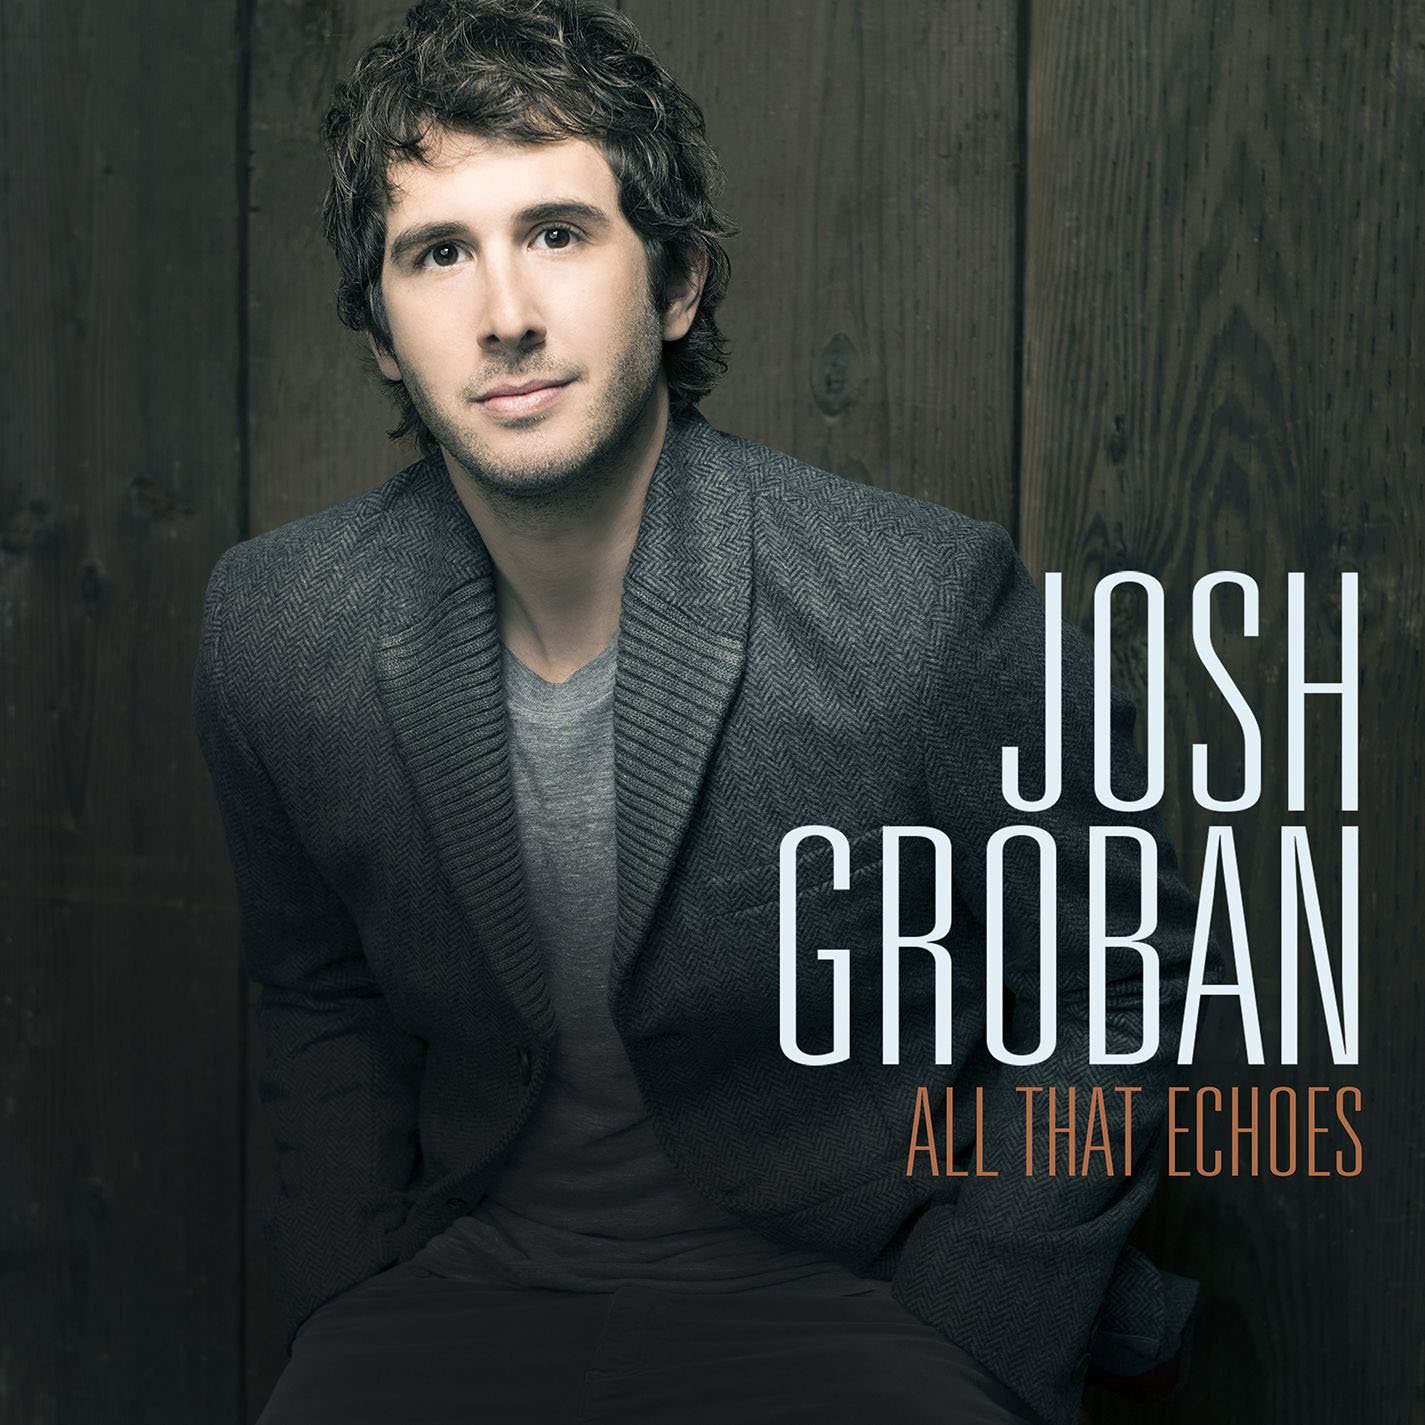 Josh Groban - All That Echoes - Amazon.com Music